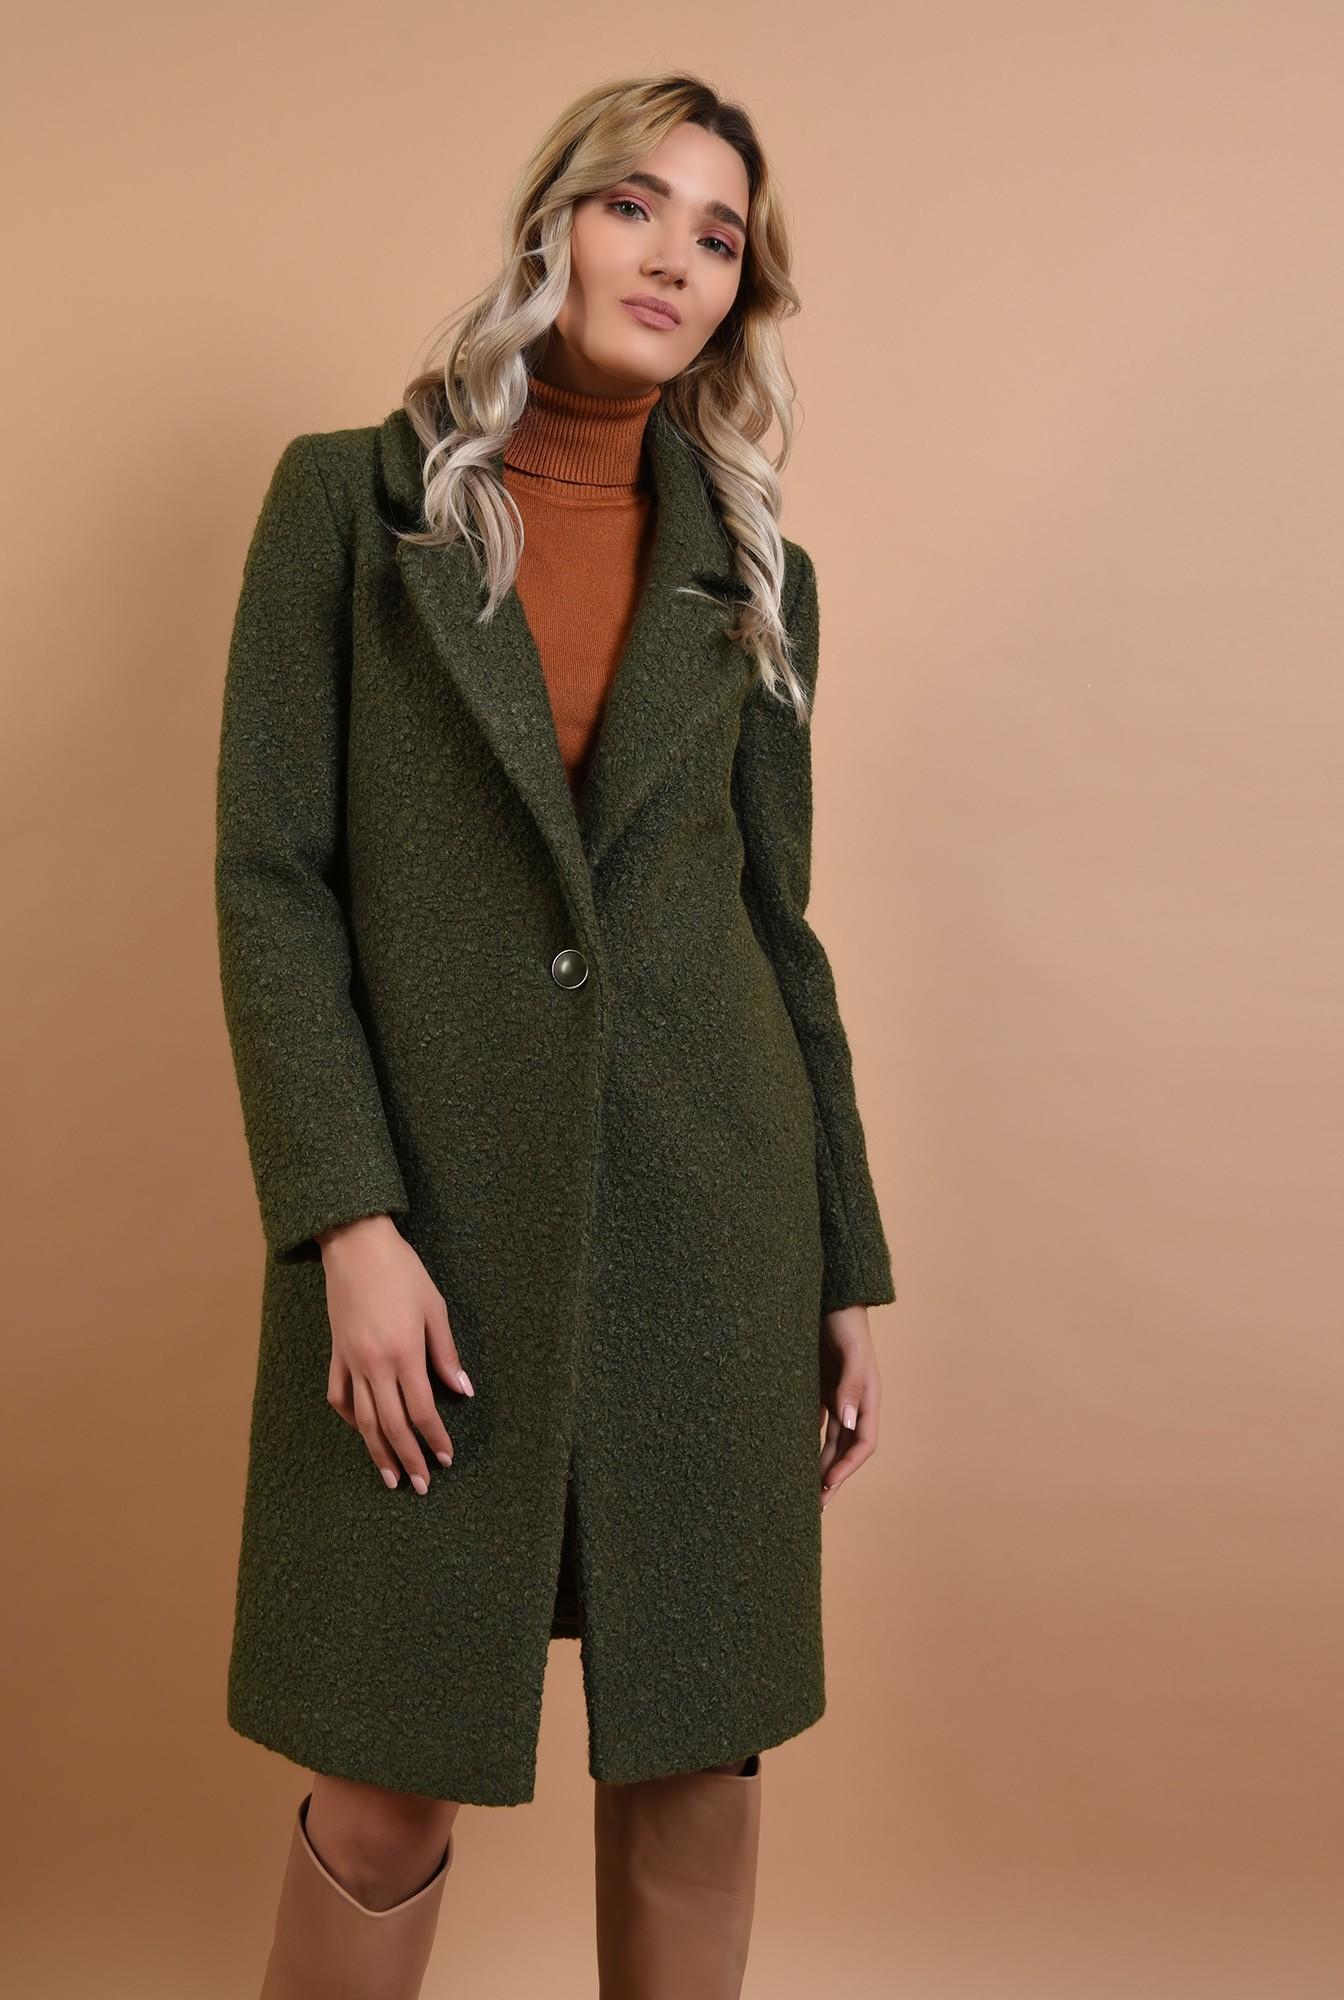 0 - palton kaki, cu nasture, cu revere, lana buclata